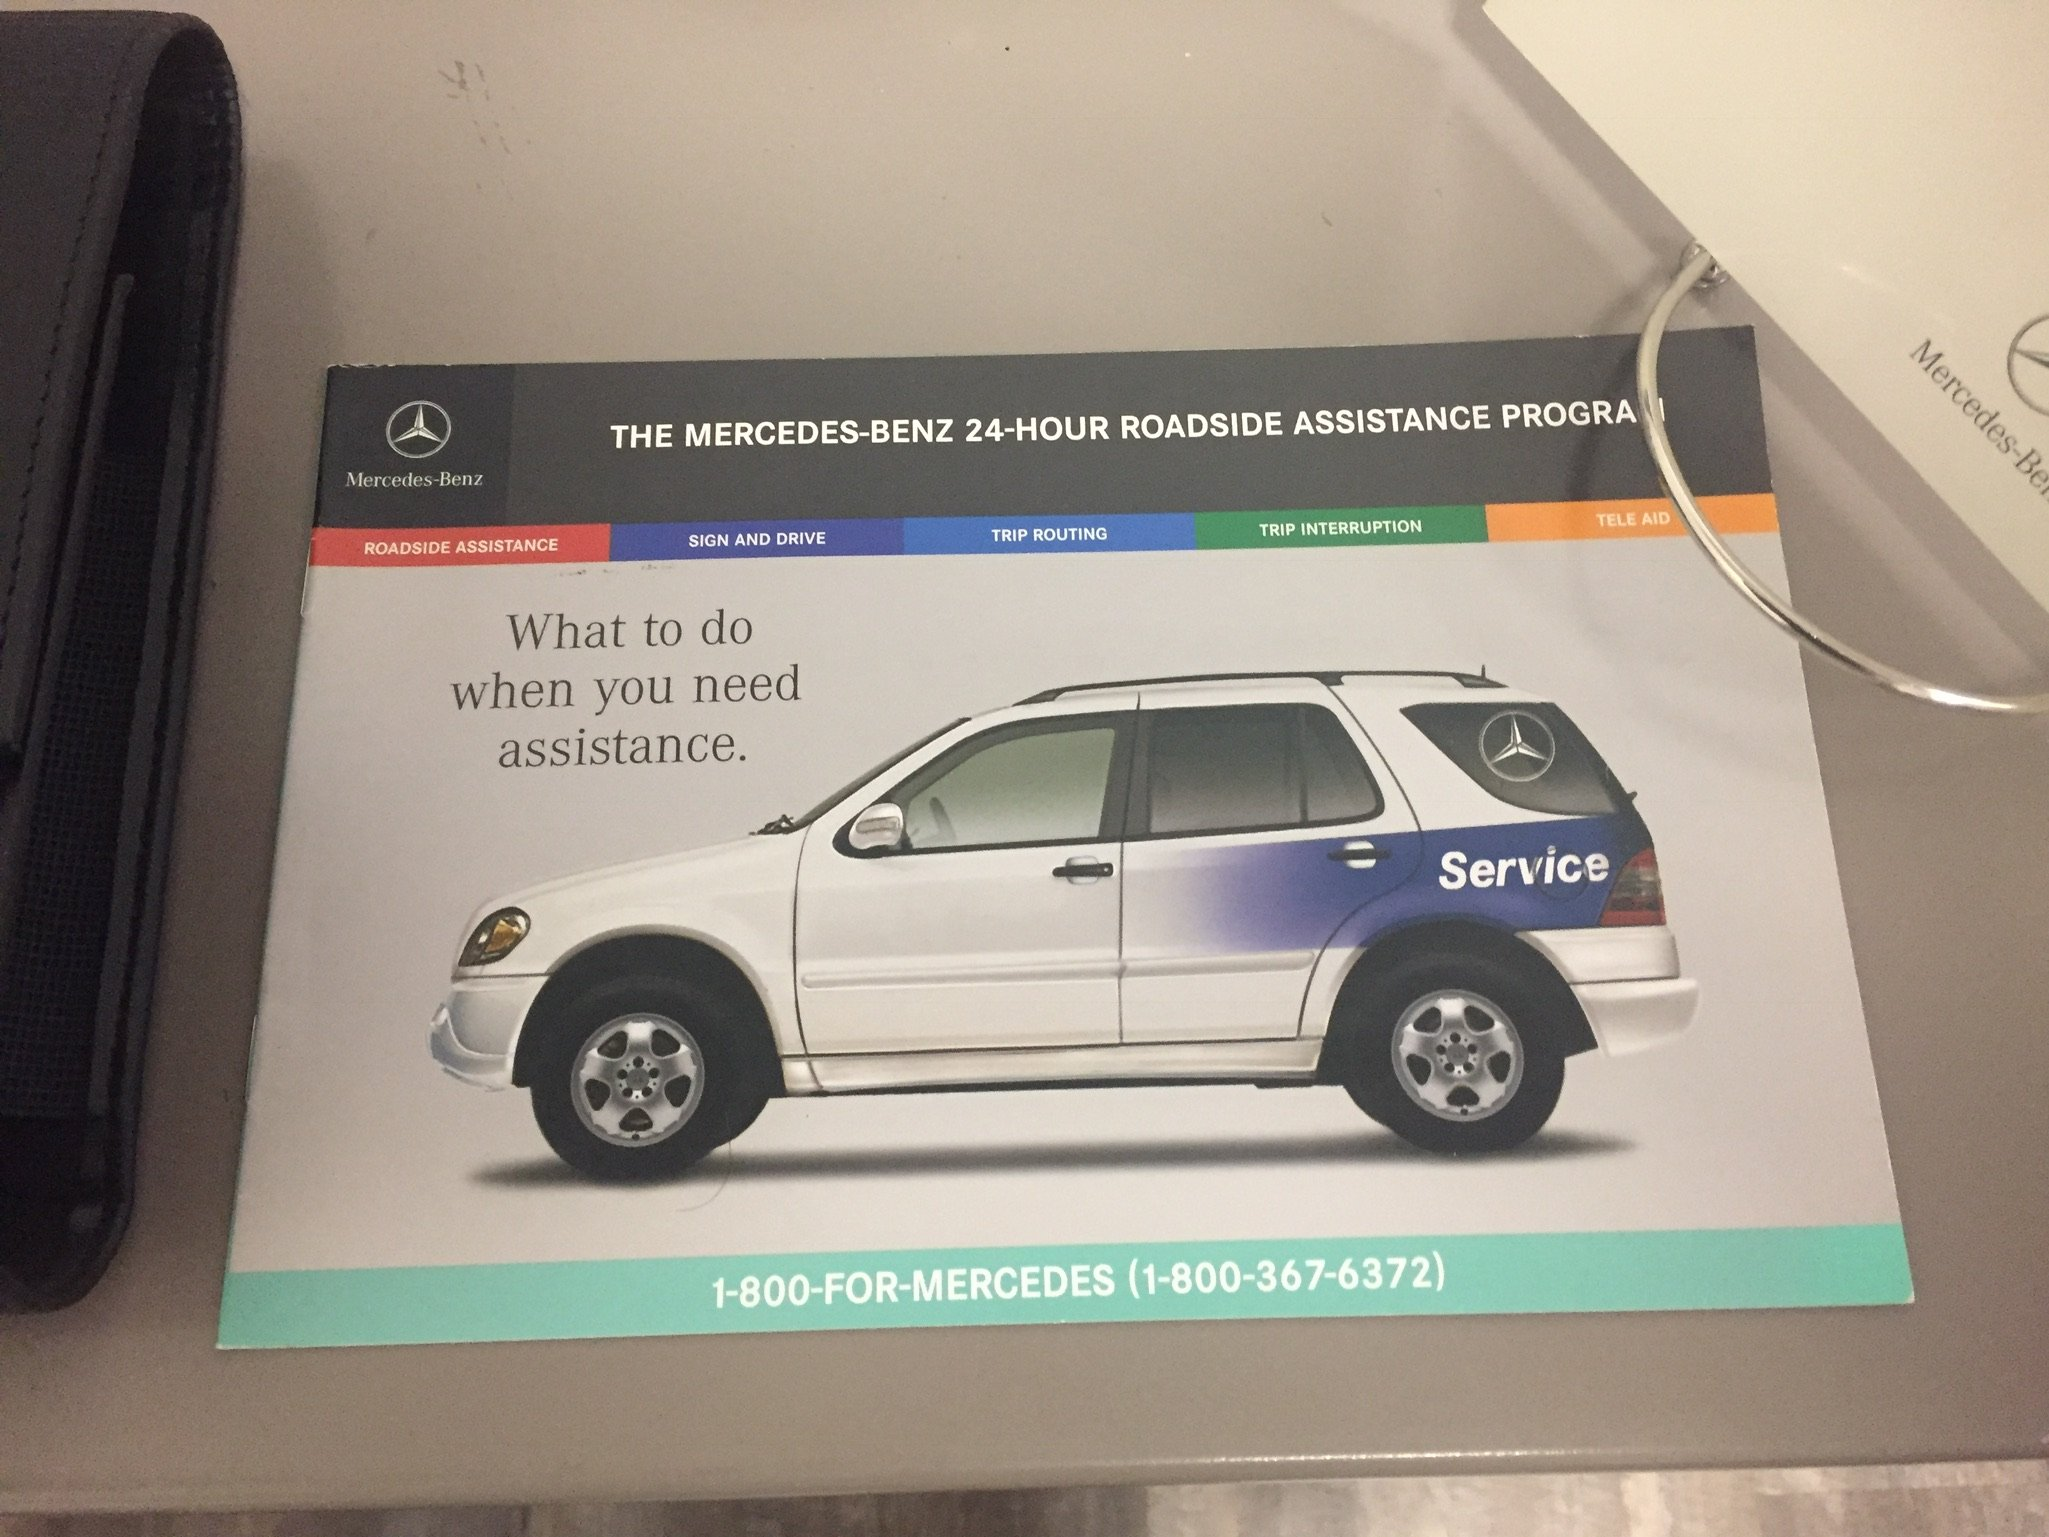 MERCEDESBENZ E E E AMG OWNERS MANUAL SET Mercedez - Mercedes benz 24 hour roadside assistance